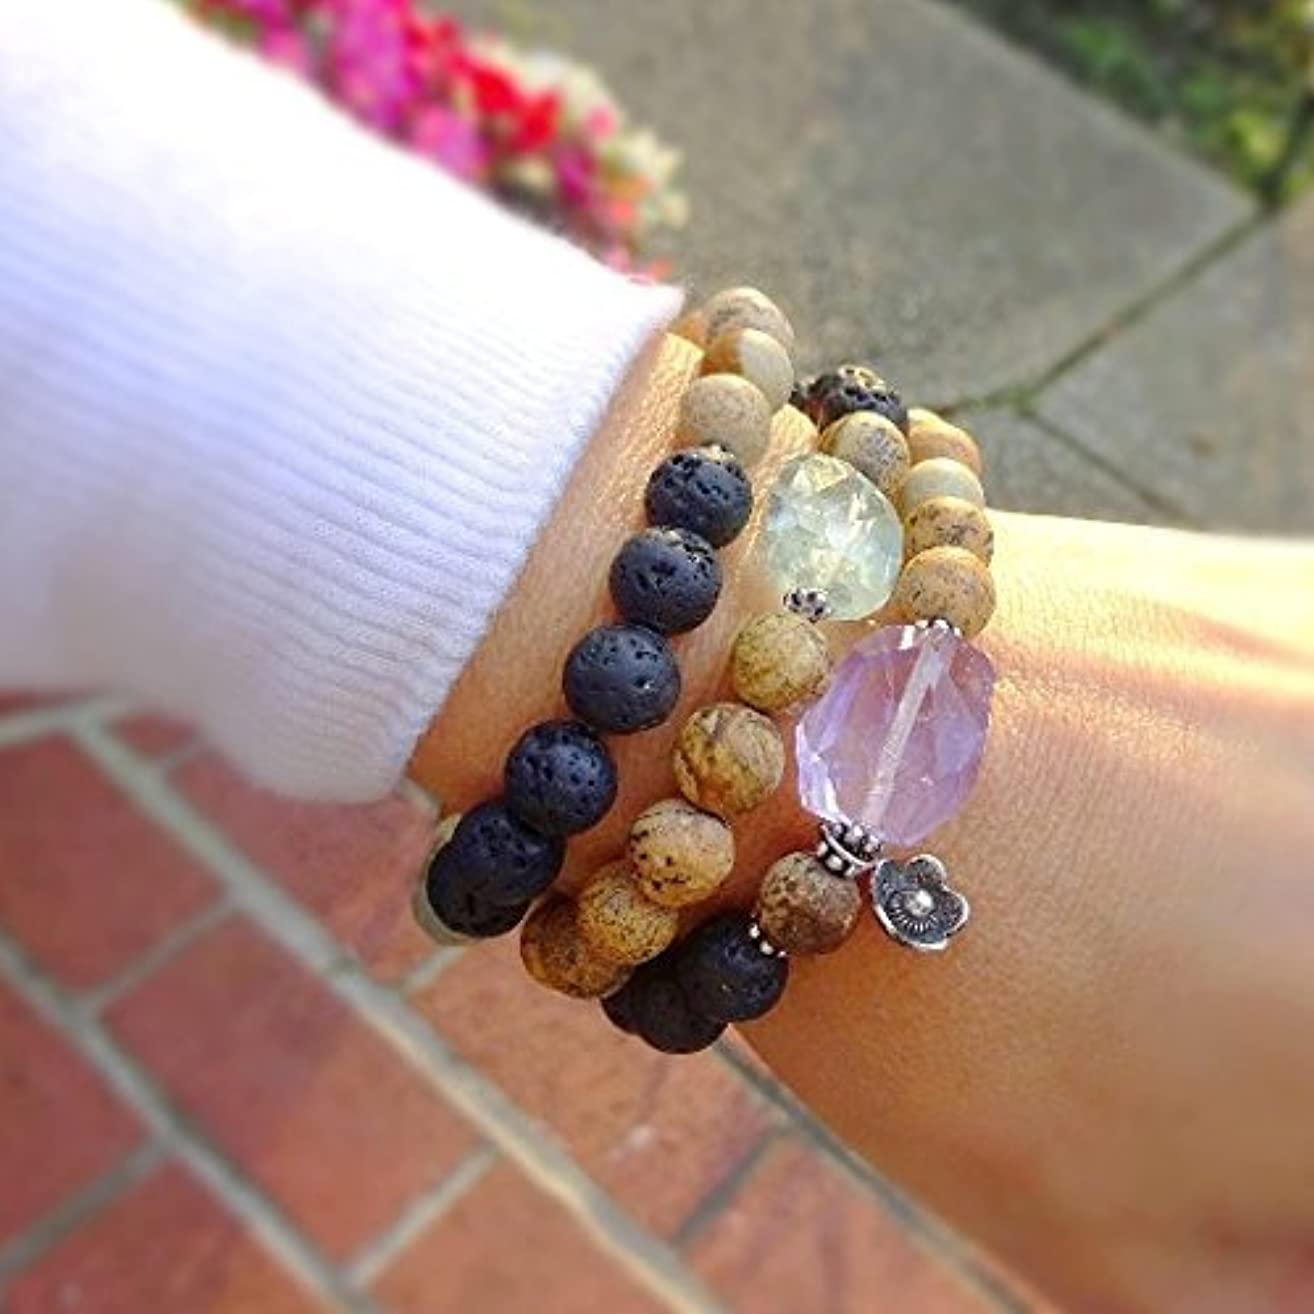 Essential oil diffuser stretch bracelet, volcanic lava rock & jasper, gemstone nugget, amethyst quartz crystal healing stones